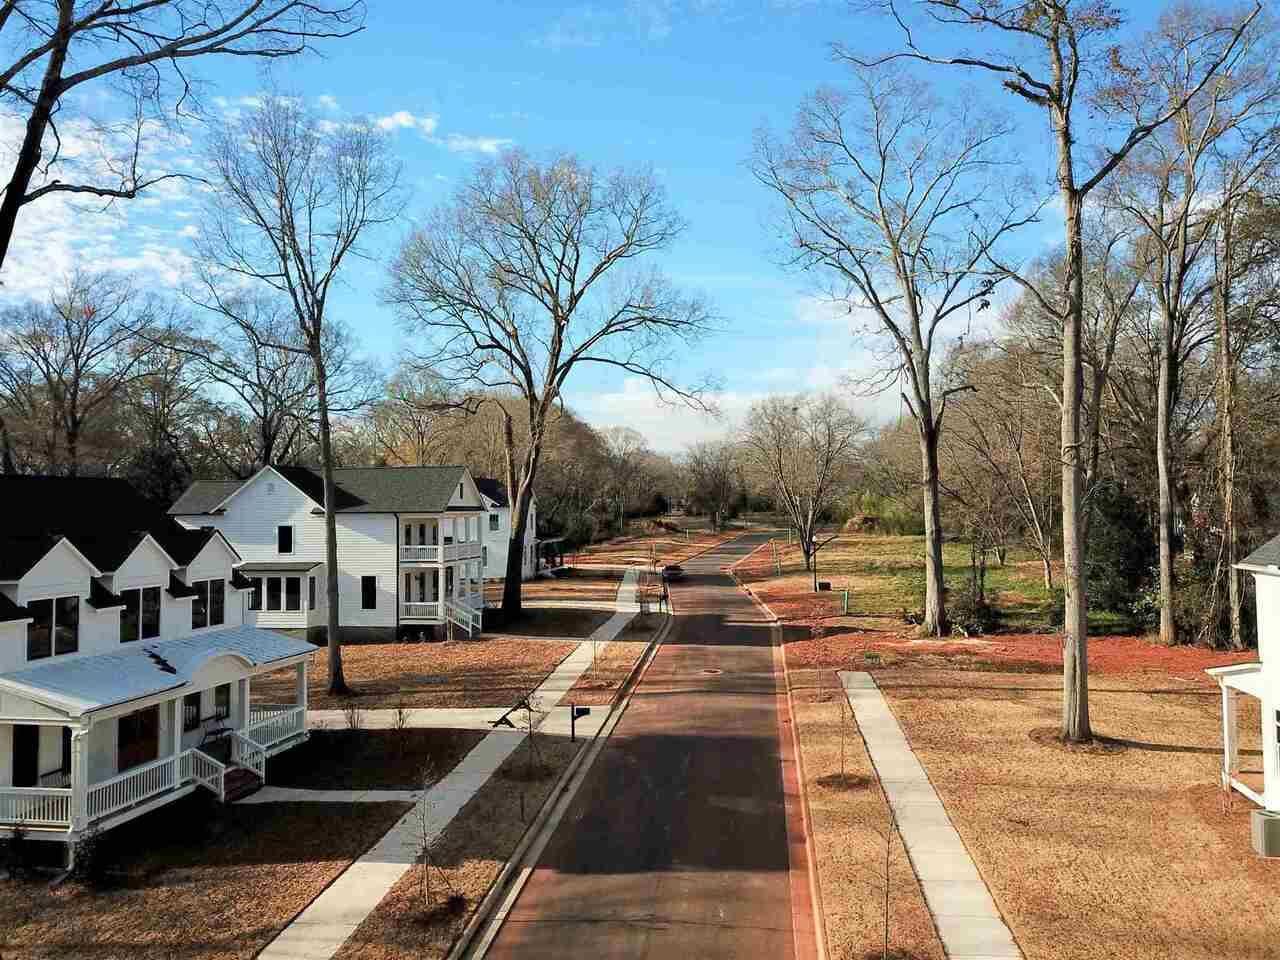 Photo of 690 Foster Park Ln, Madison, GA 30650 (MLS # 8905182)